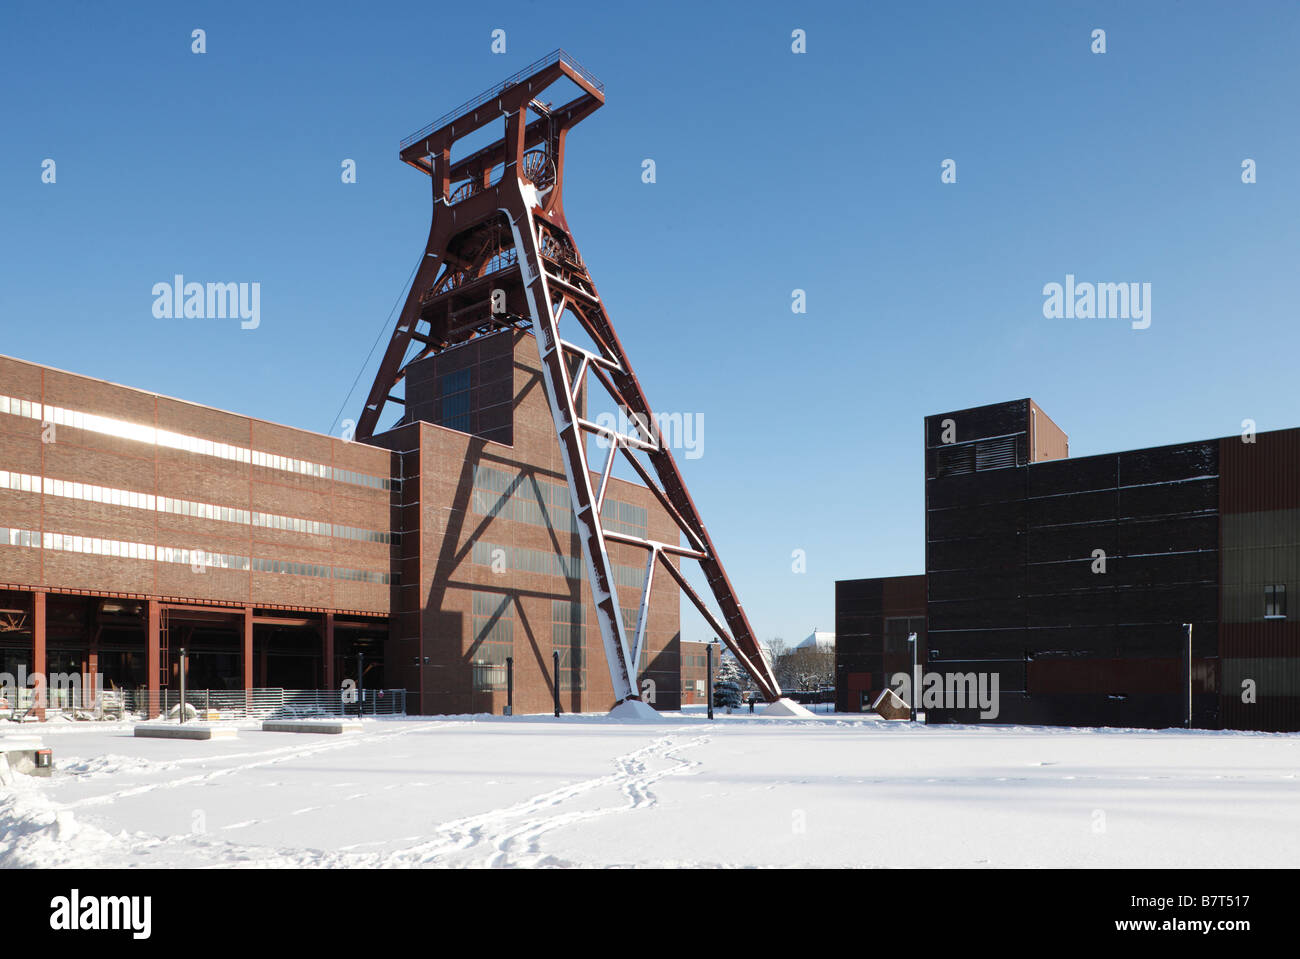 Essen, Zeche Zollverein im Schnee, Zentraler Schacht XII, Förderturm - Stock Image